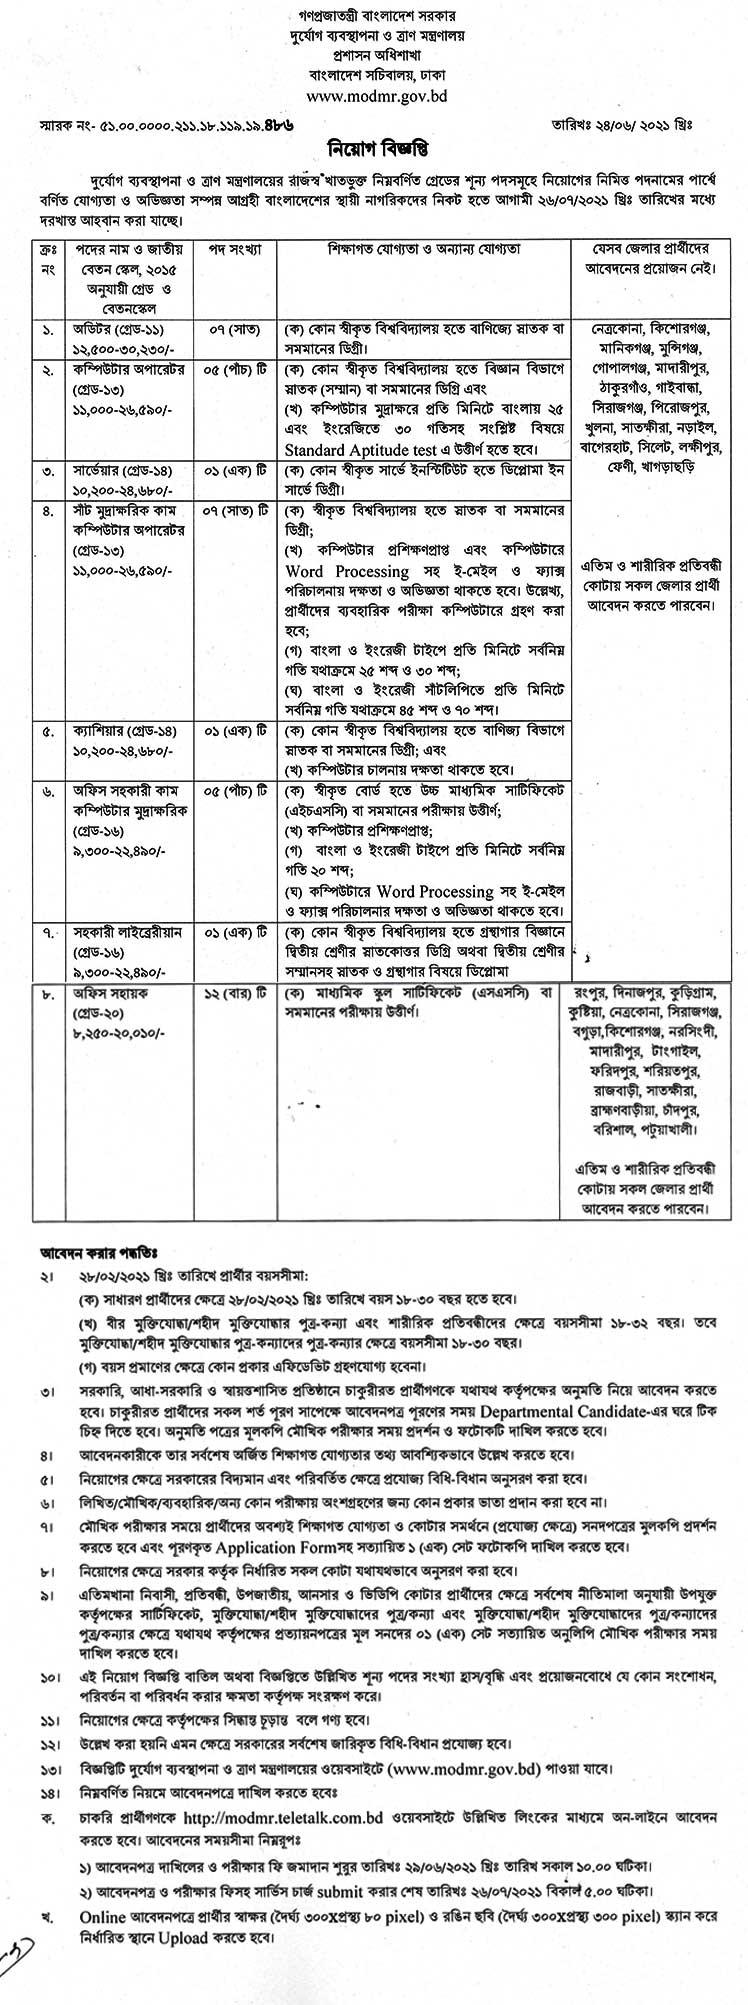 MODMR Job Circular 01